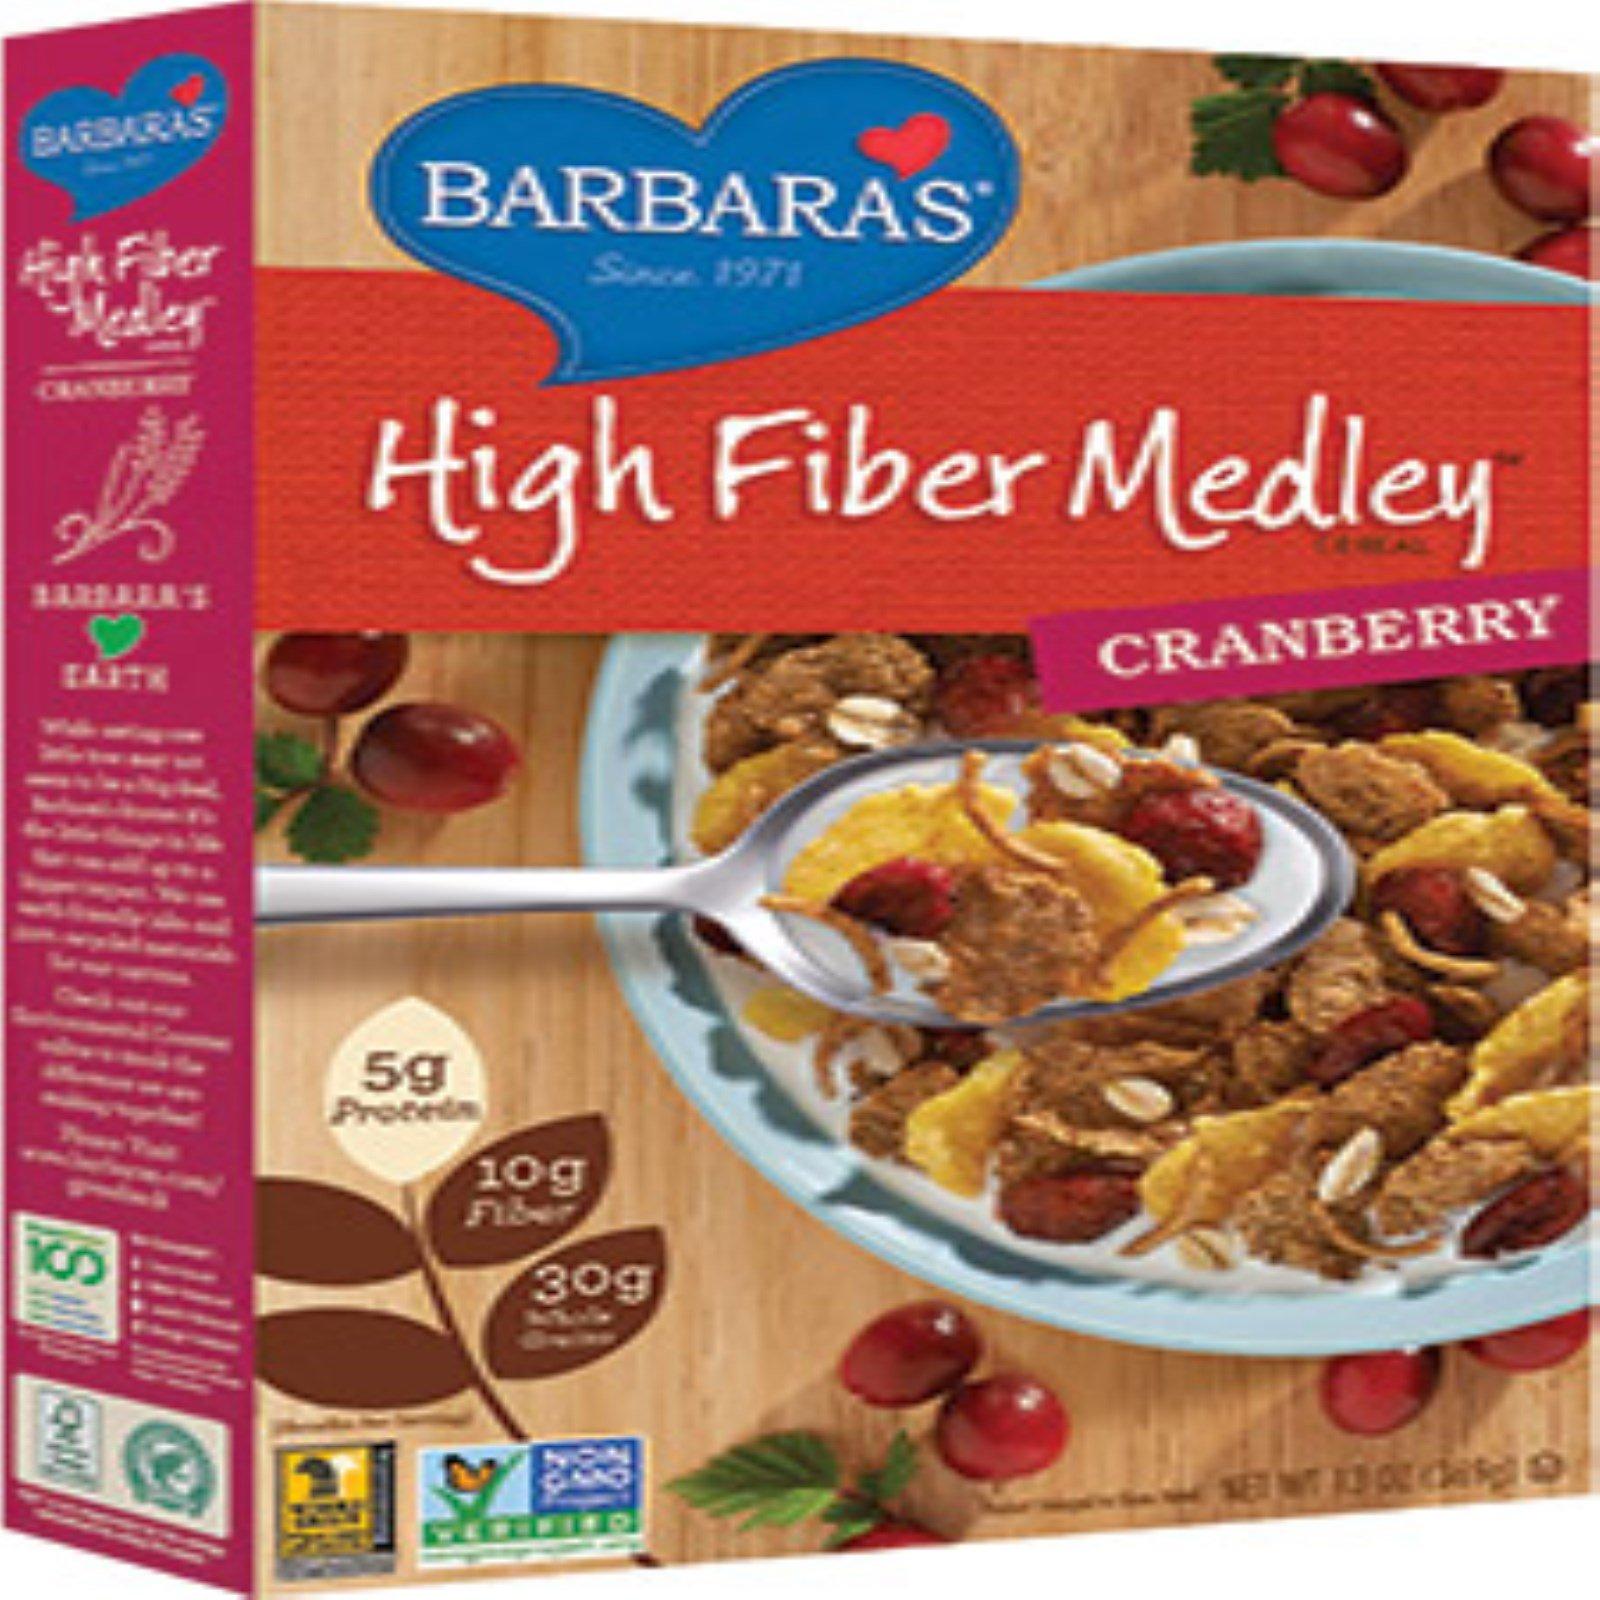 Barbara's Bakery, High Fiber Cereal, Cranberry, 13 Oz (369